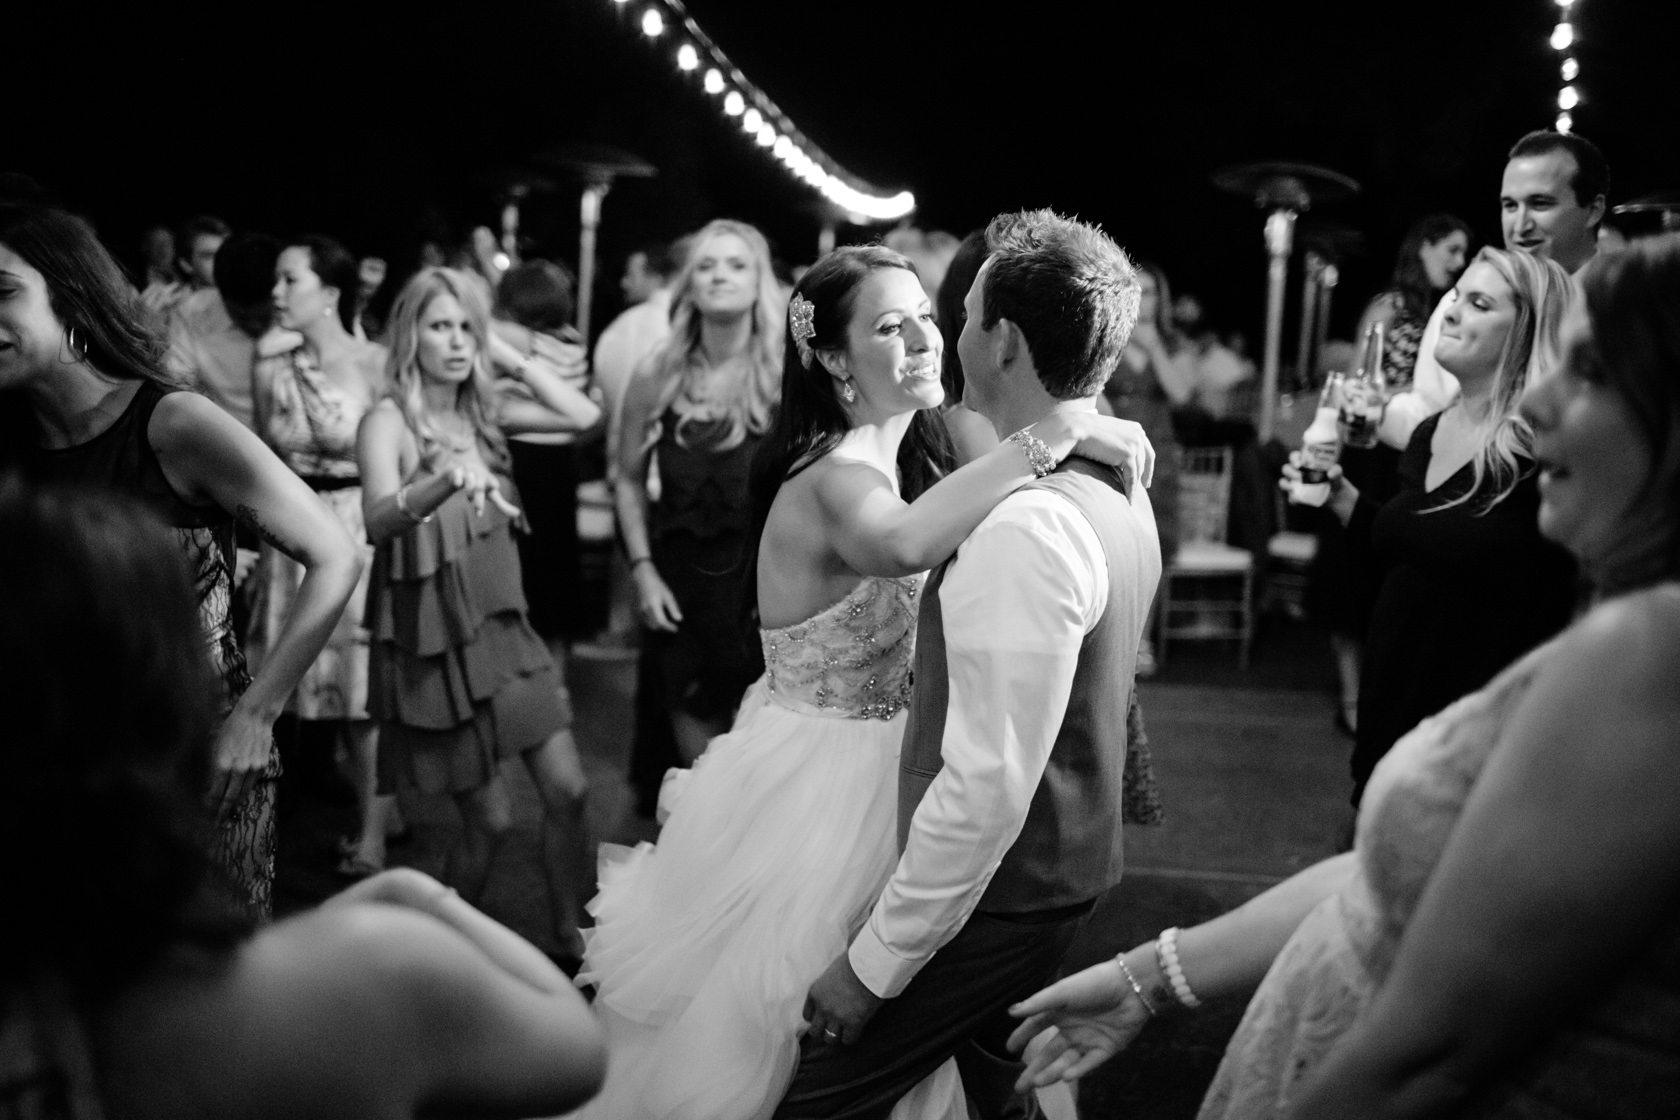 Temecula_Creek_Inn_Wedding_154.jpg